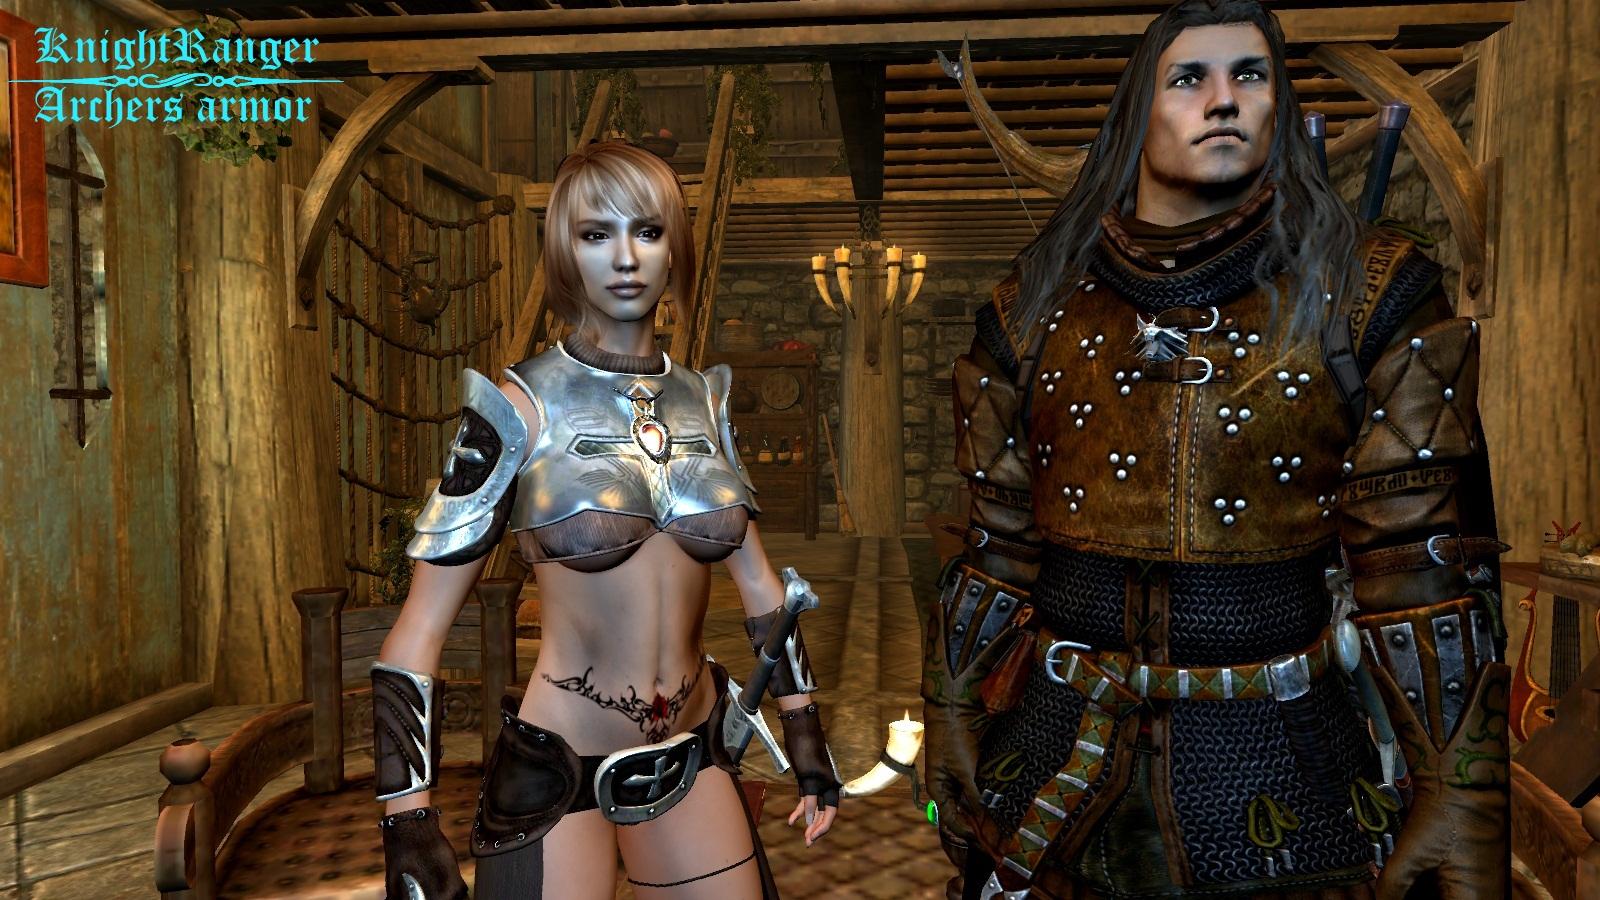 Knightranger_Archers_Armor.jpg